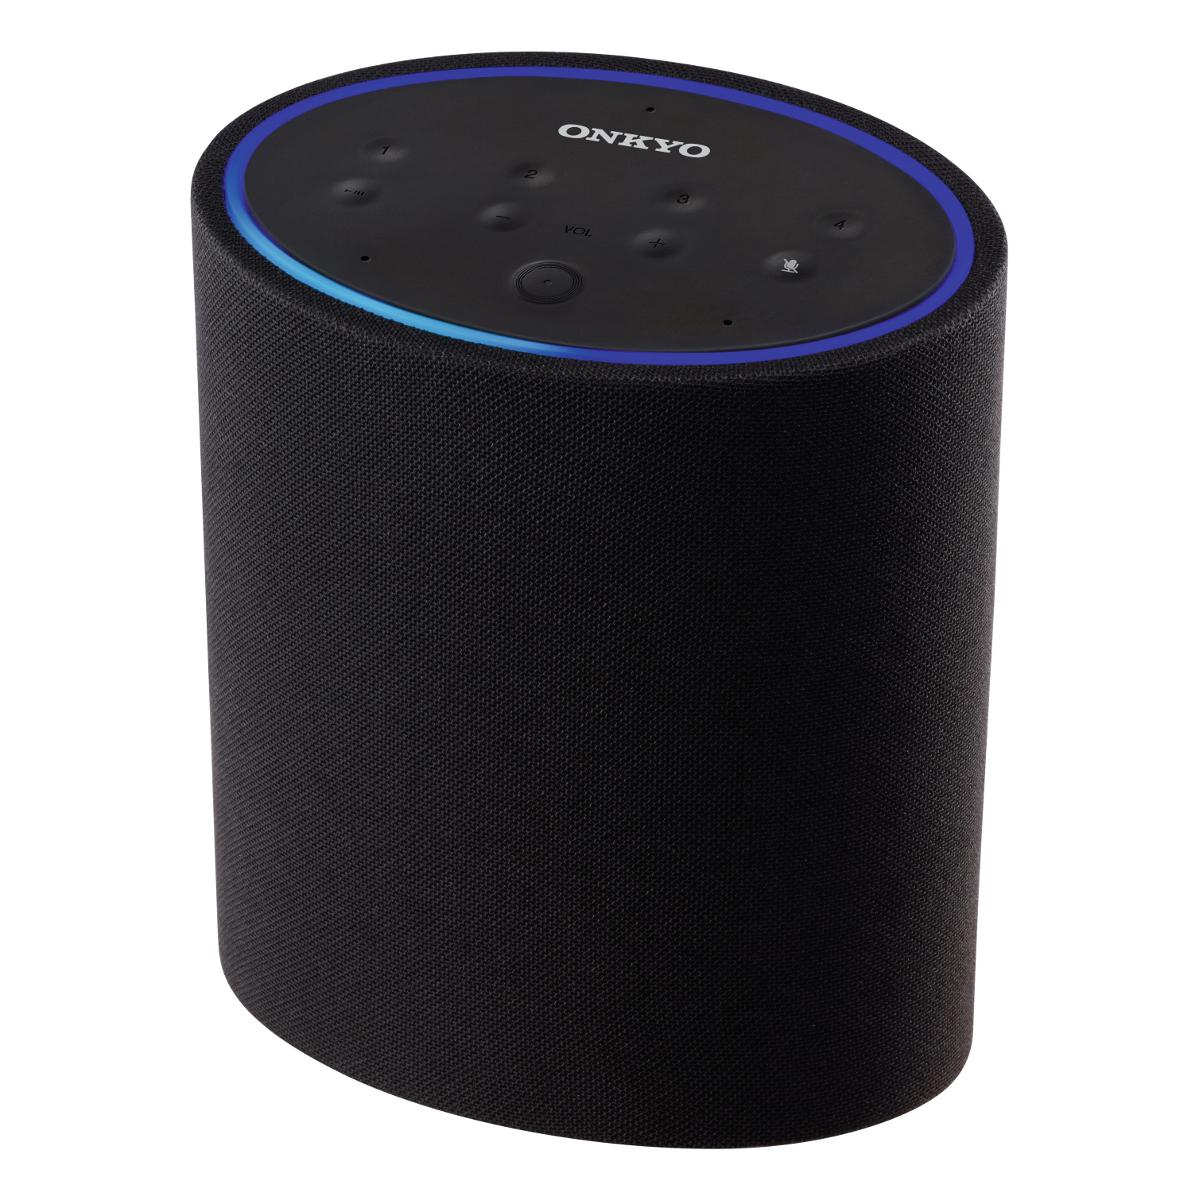 ONKYO VCPX30  Wireless Smart Sound Speaker with Amazon Alexa £49.99 @ Hughes